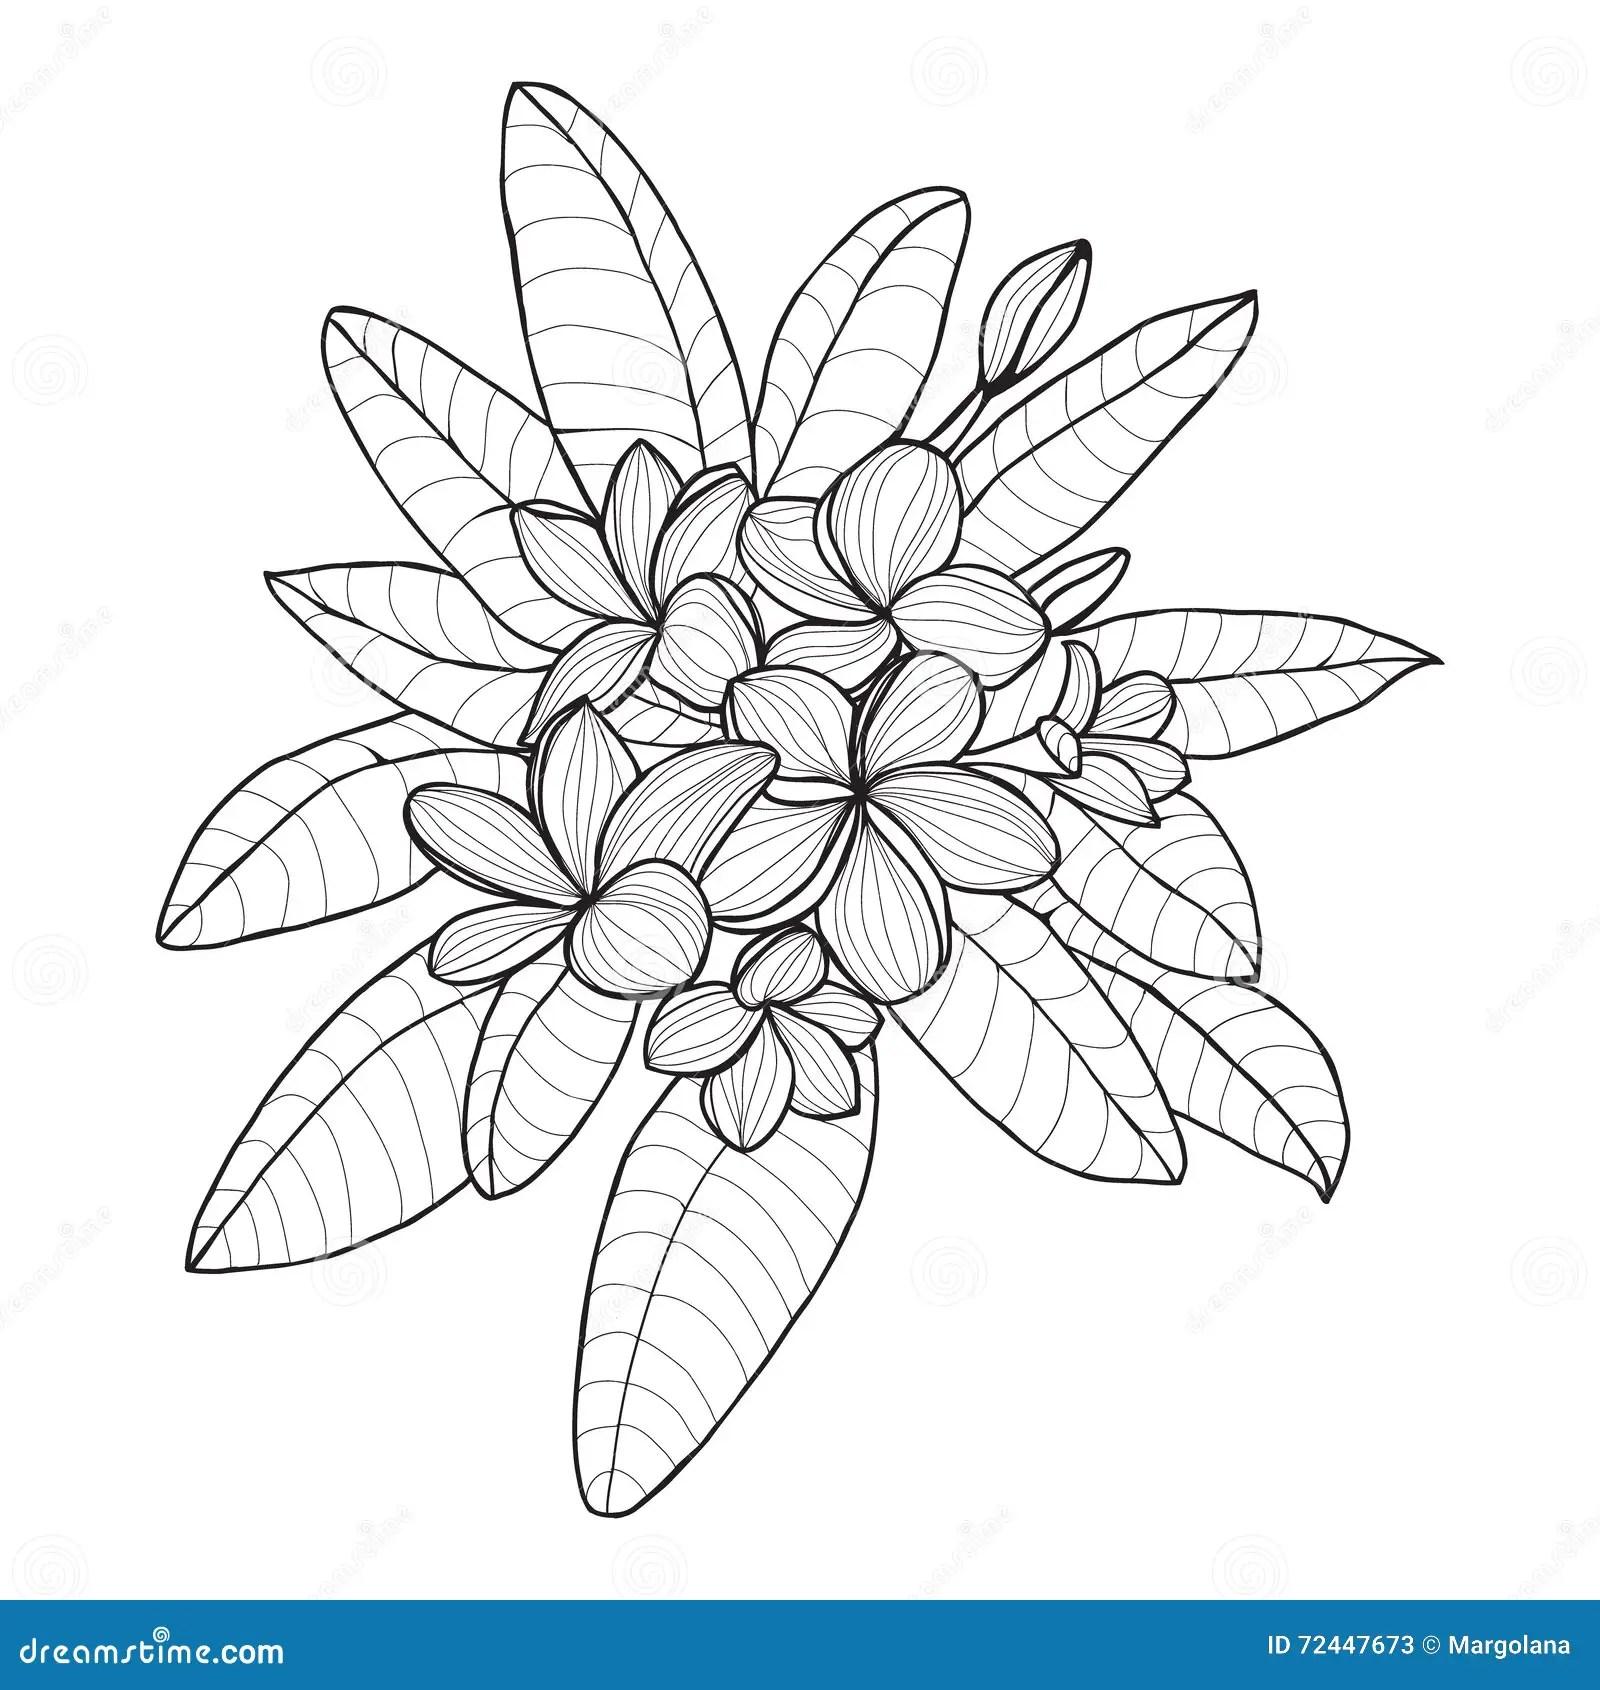 Bouquet With Plumeria Or Frangipani Flower On White